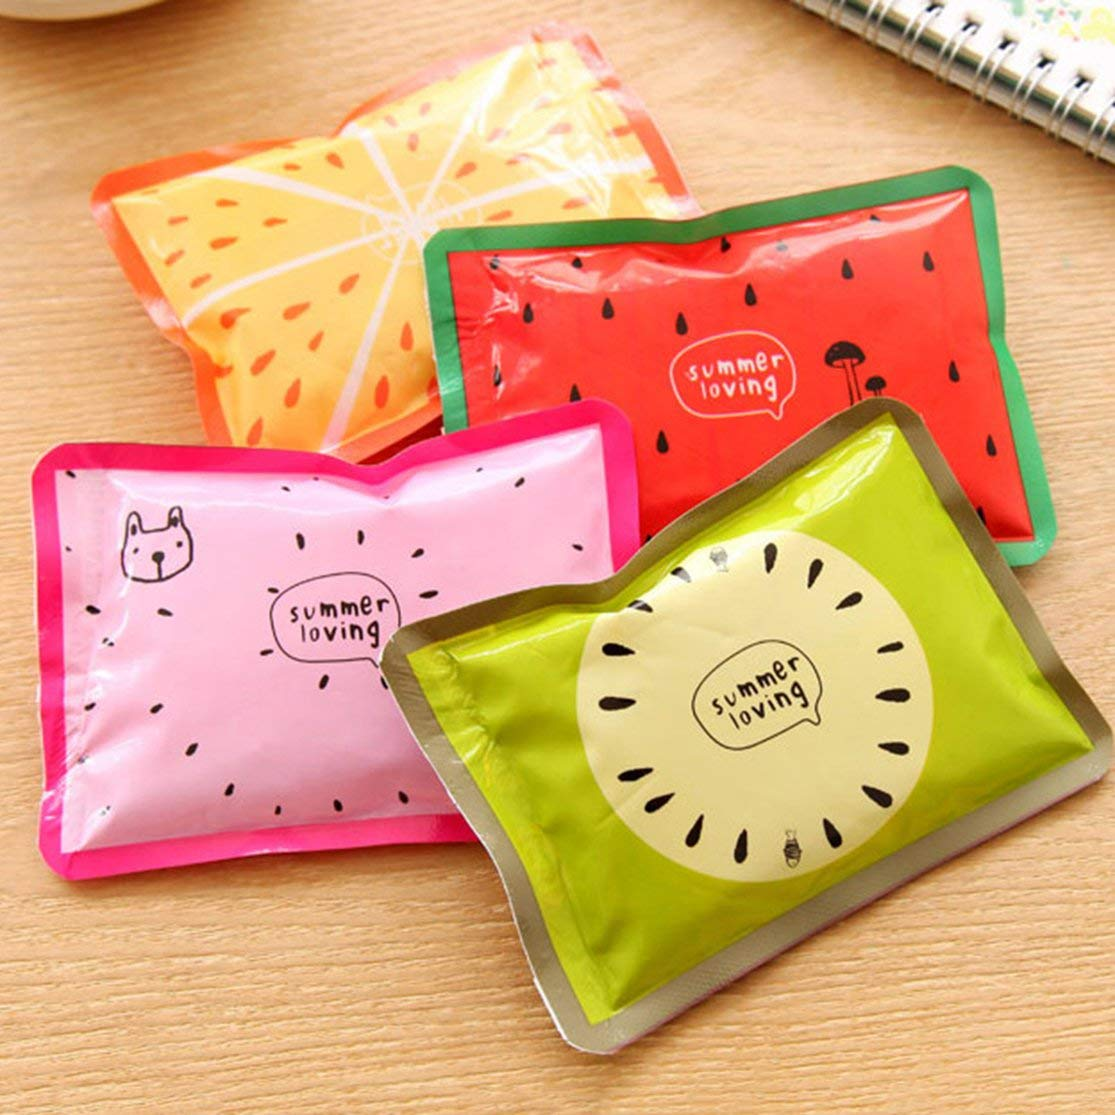 11cm Cute Cartoon Summer Cold Cooler Bags Multifunzione Riutilizzabile Gel Ice Bag Fresco Pacchetto Sanit/à Pain Relief LouiseEvel215 8